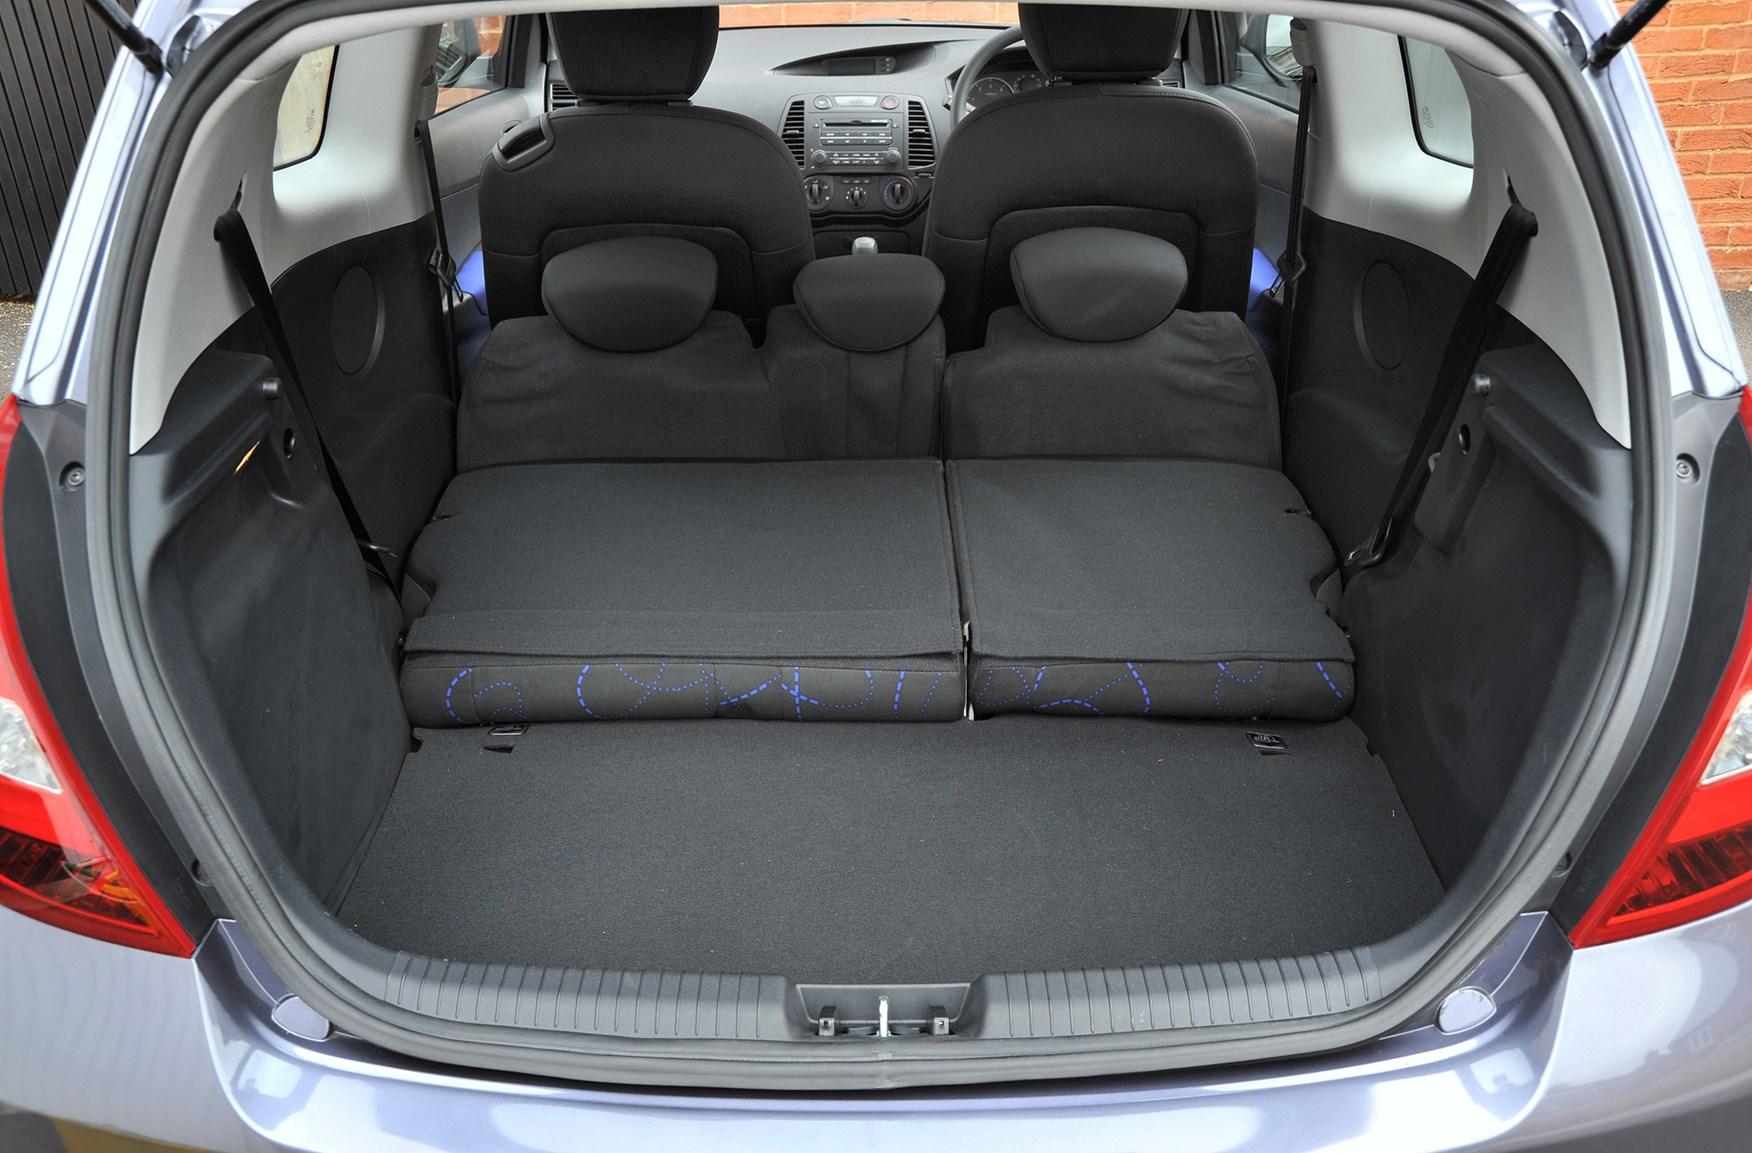 Hyundai I20 Hatchback 2009 2014 Features Equipment